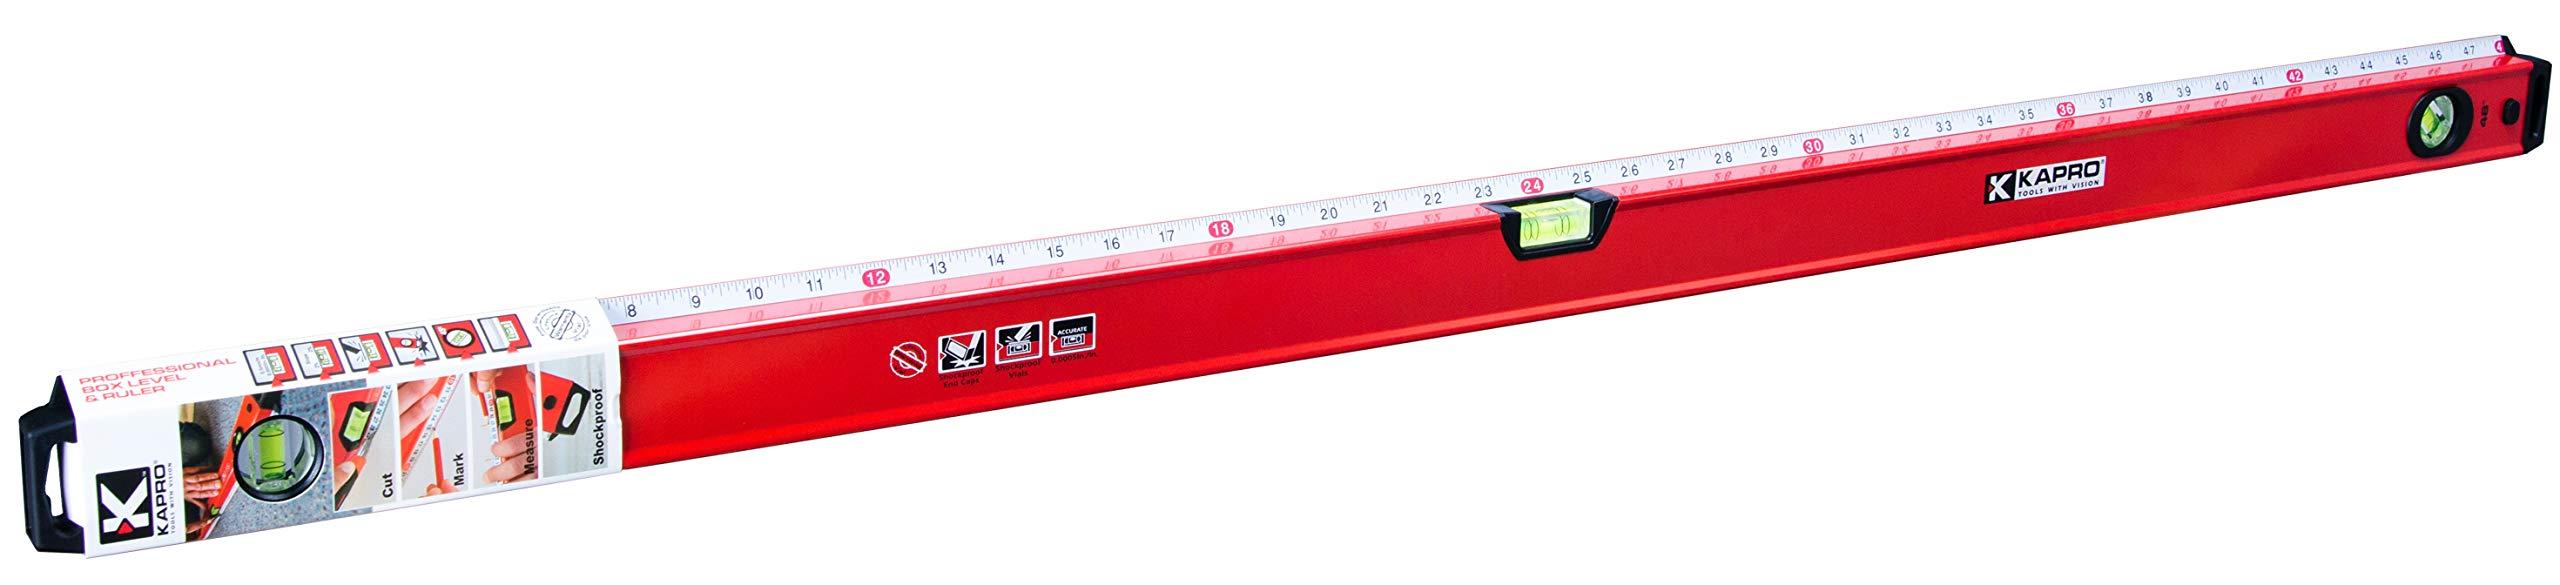 Kapro 770-42-48 Exodus Professional Box Level with 45° Vial & Ruler, 48'' Length by Kapro